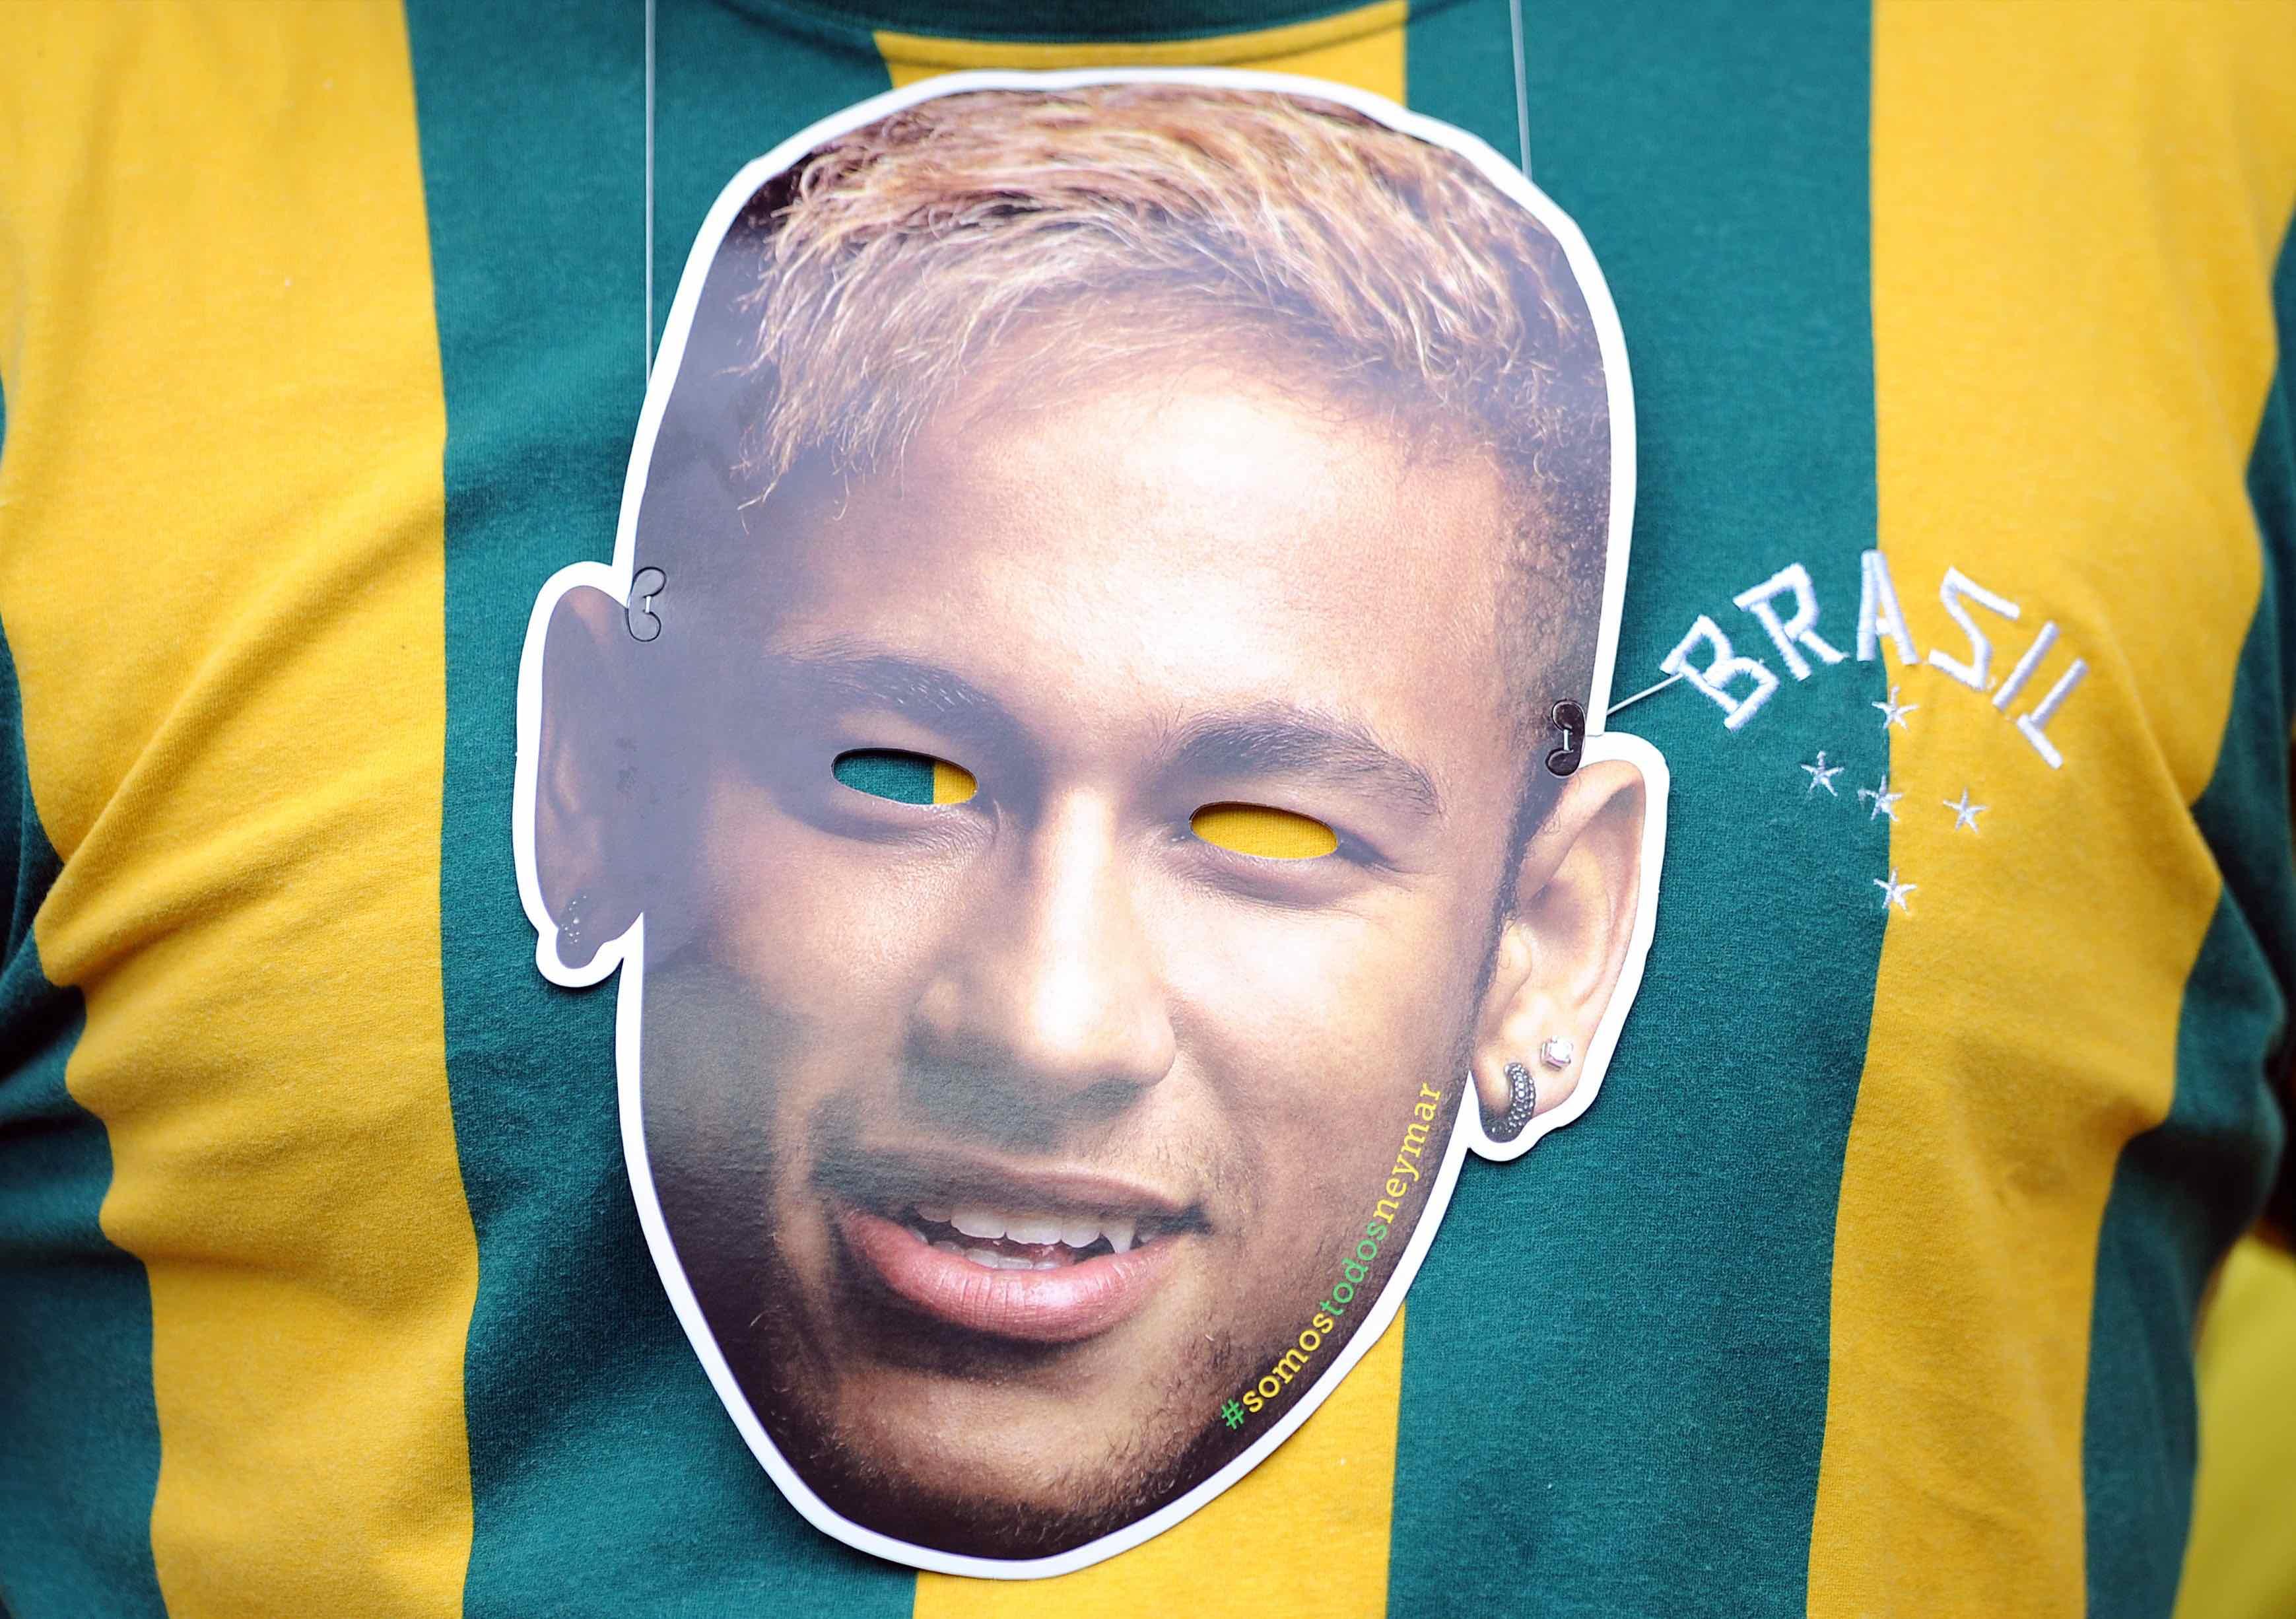 Foto da máscara de Neymar na Copa de 2014